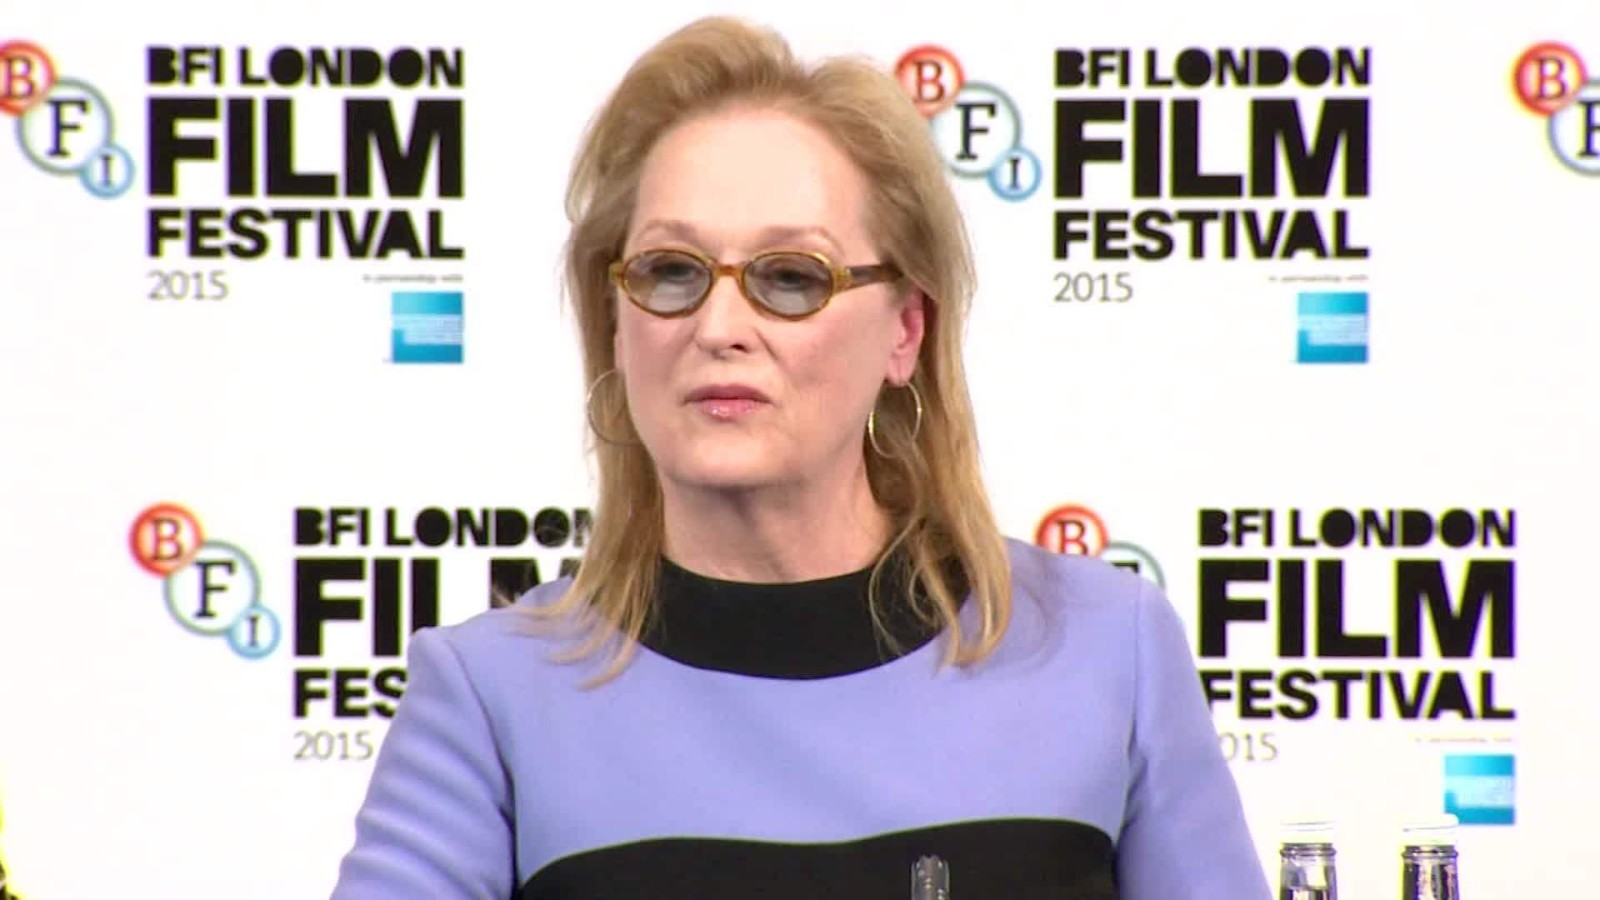 Does Hollywood have a gender problem?